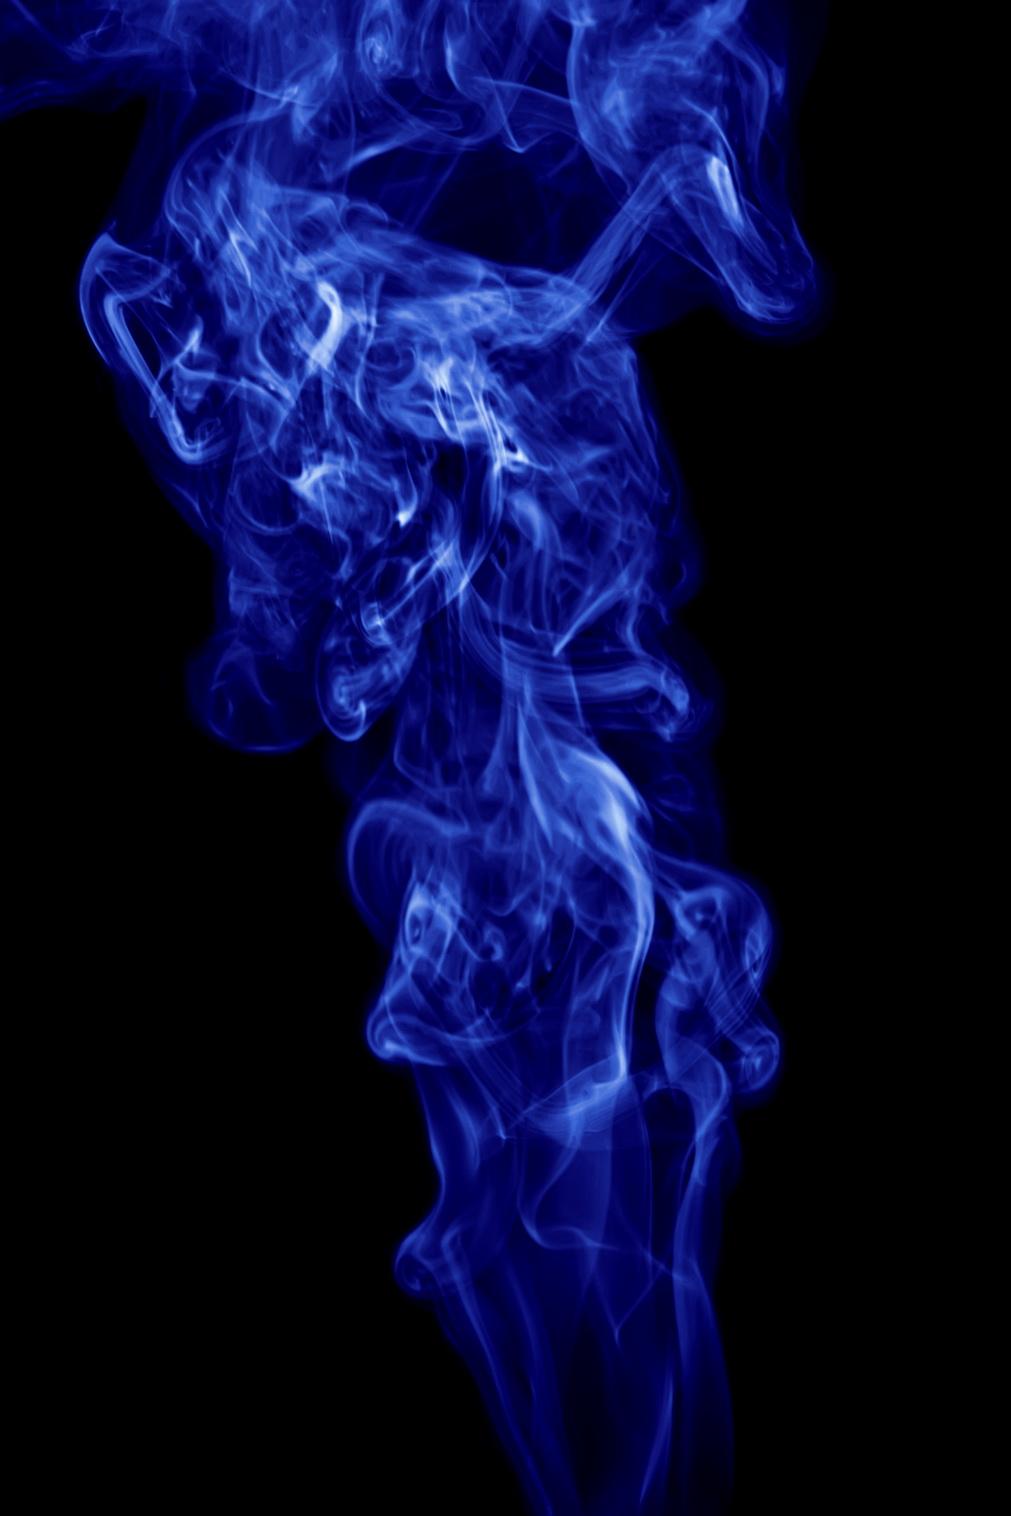 blue smoke, Flare, Flow, Smell, Smoke, HQ Photo